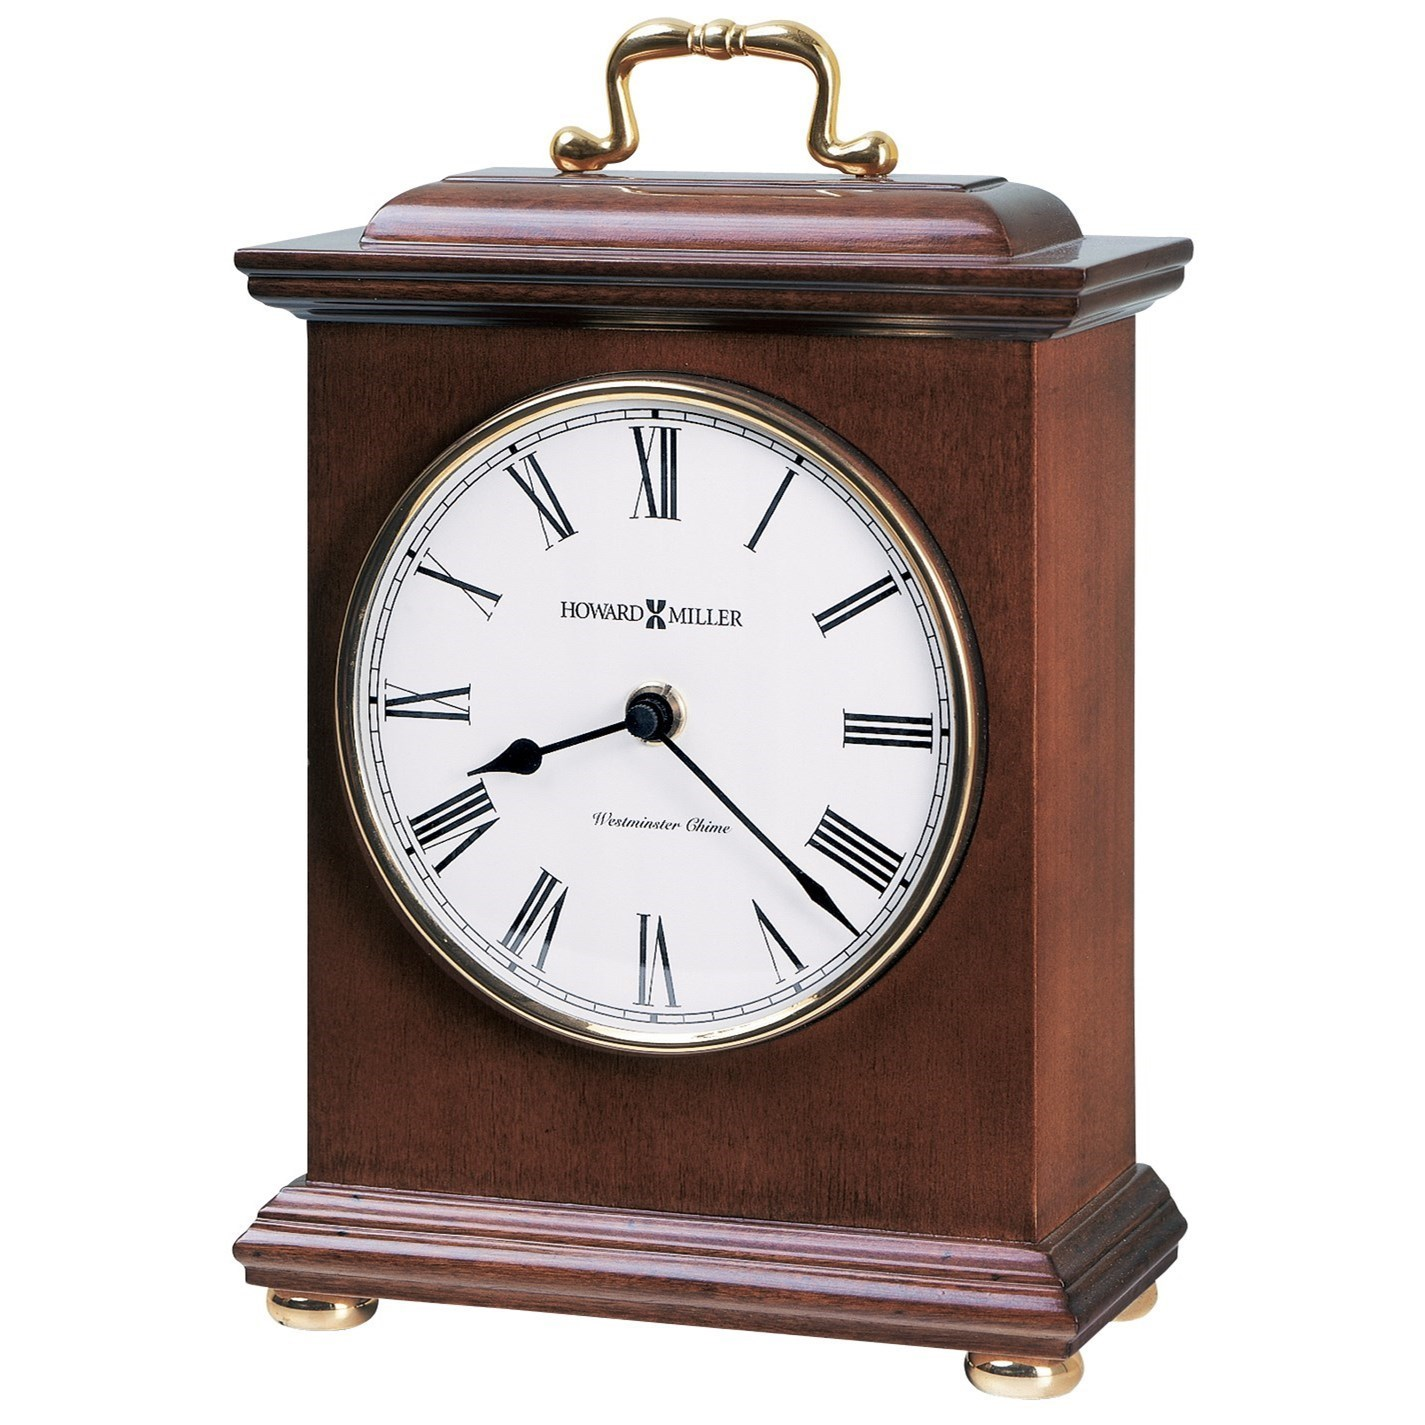 Howard Miller Table U0026 Mantel Clocks Tara Mantle Clock